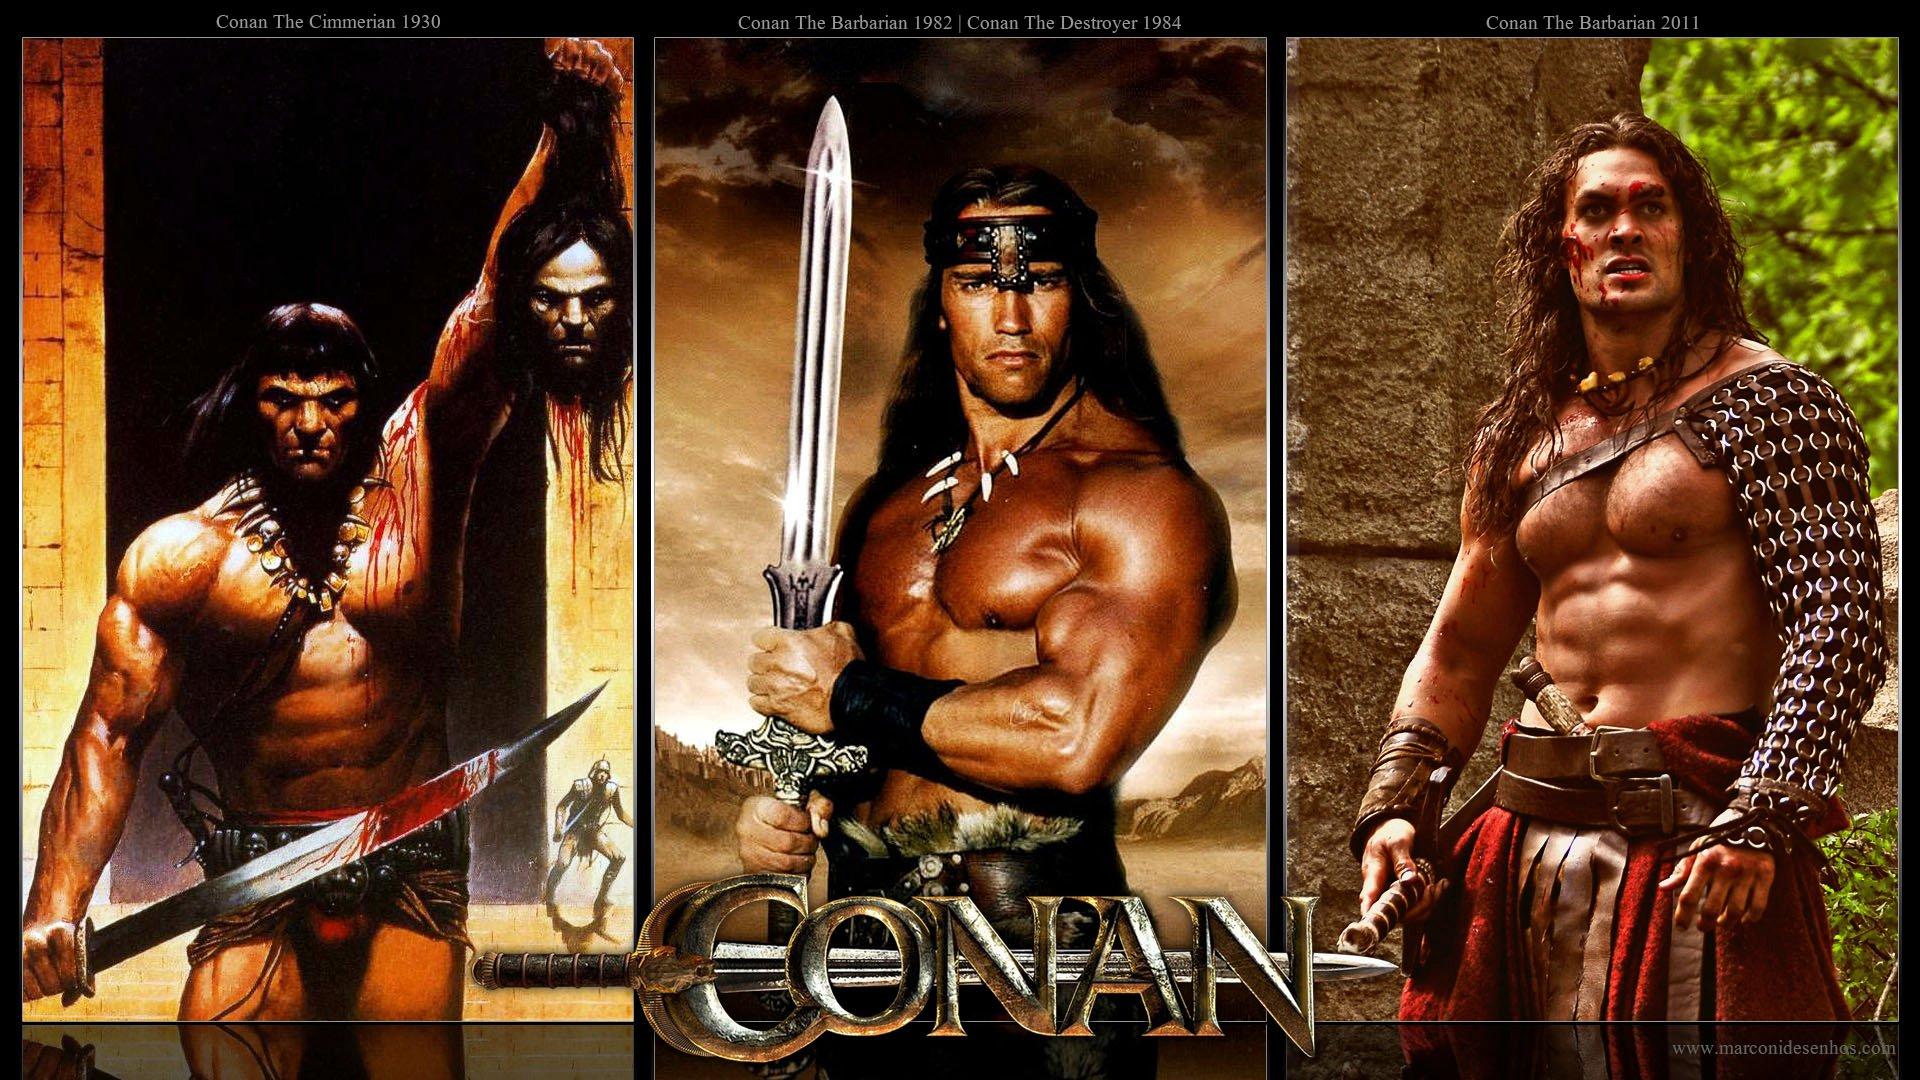 Conan 2011 Stunning conan the barbarian posters 1930 - 2011 - blackfilm/read